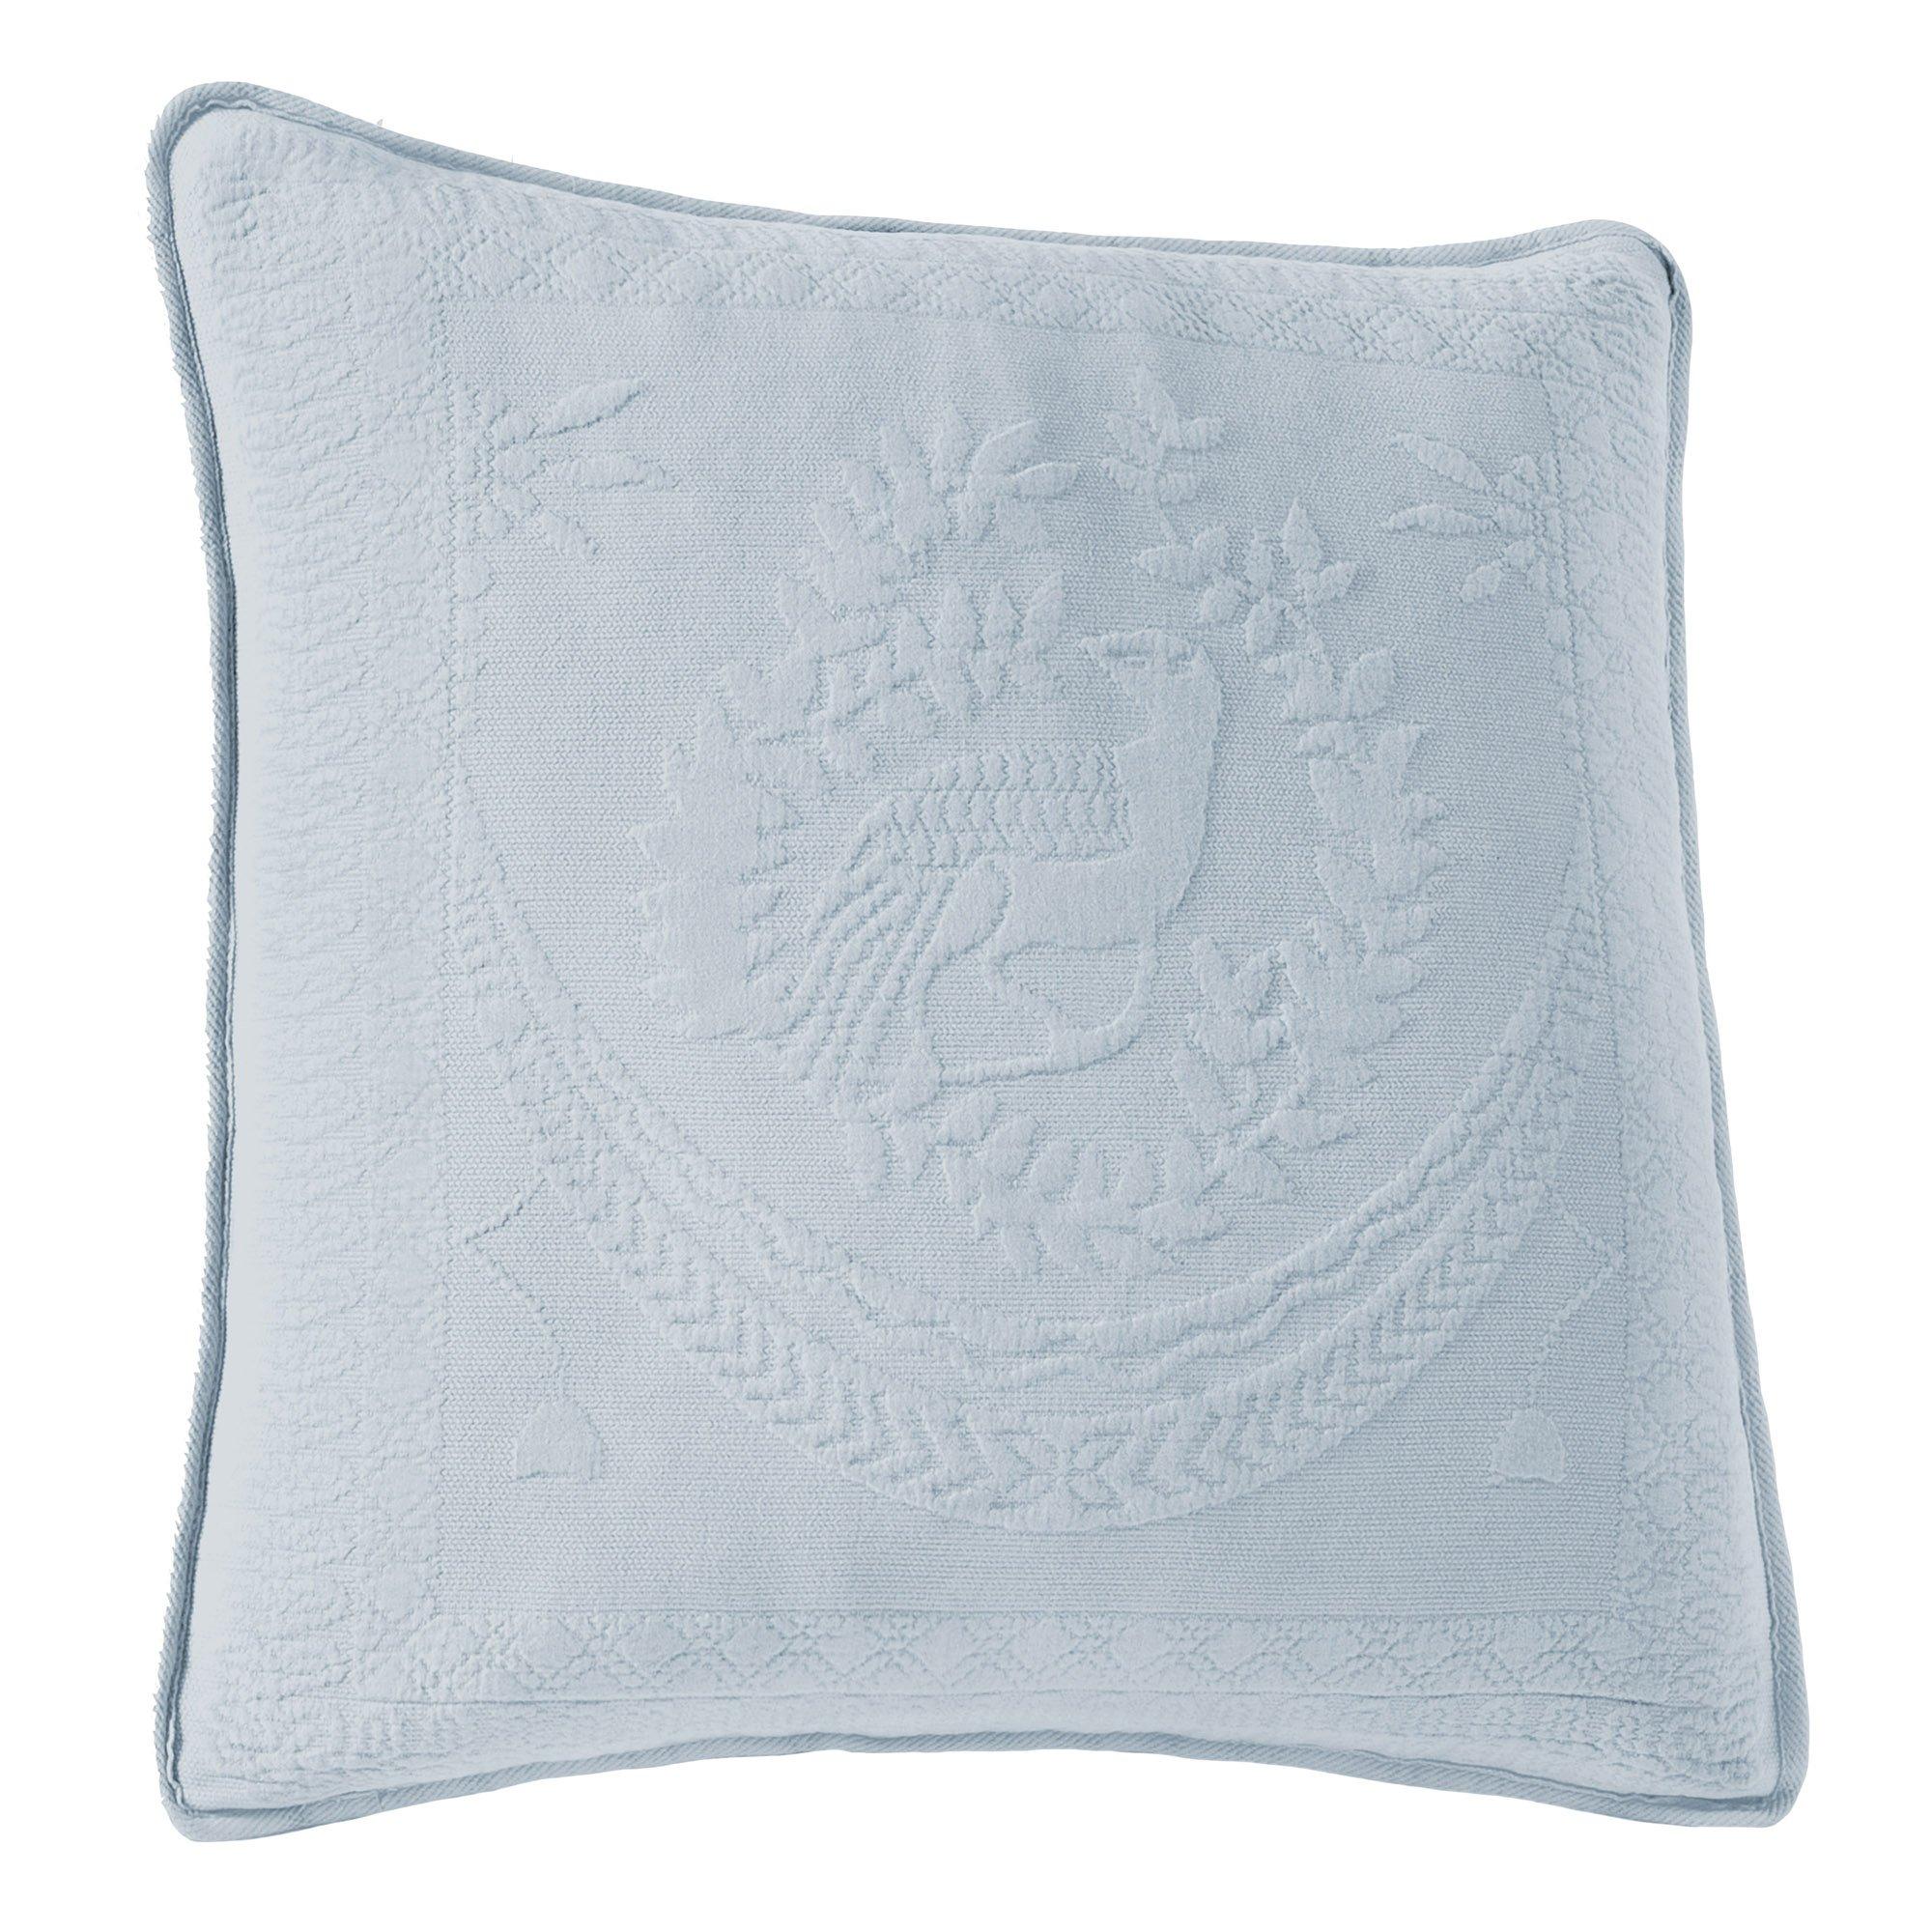 Historic Charleston 13995020X020BLU King Charles Matelasse 20-Inch by 20-Inch Decorative Pillow, Blue